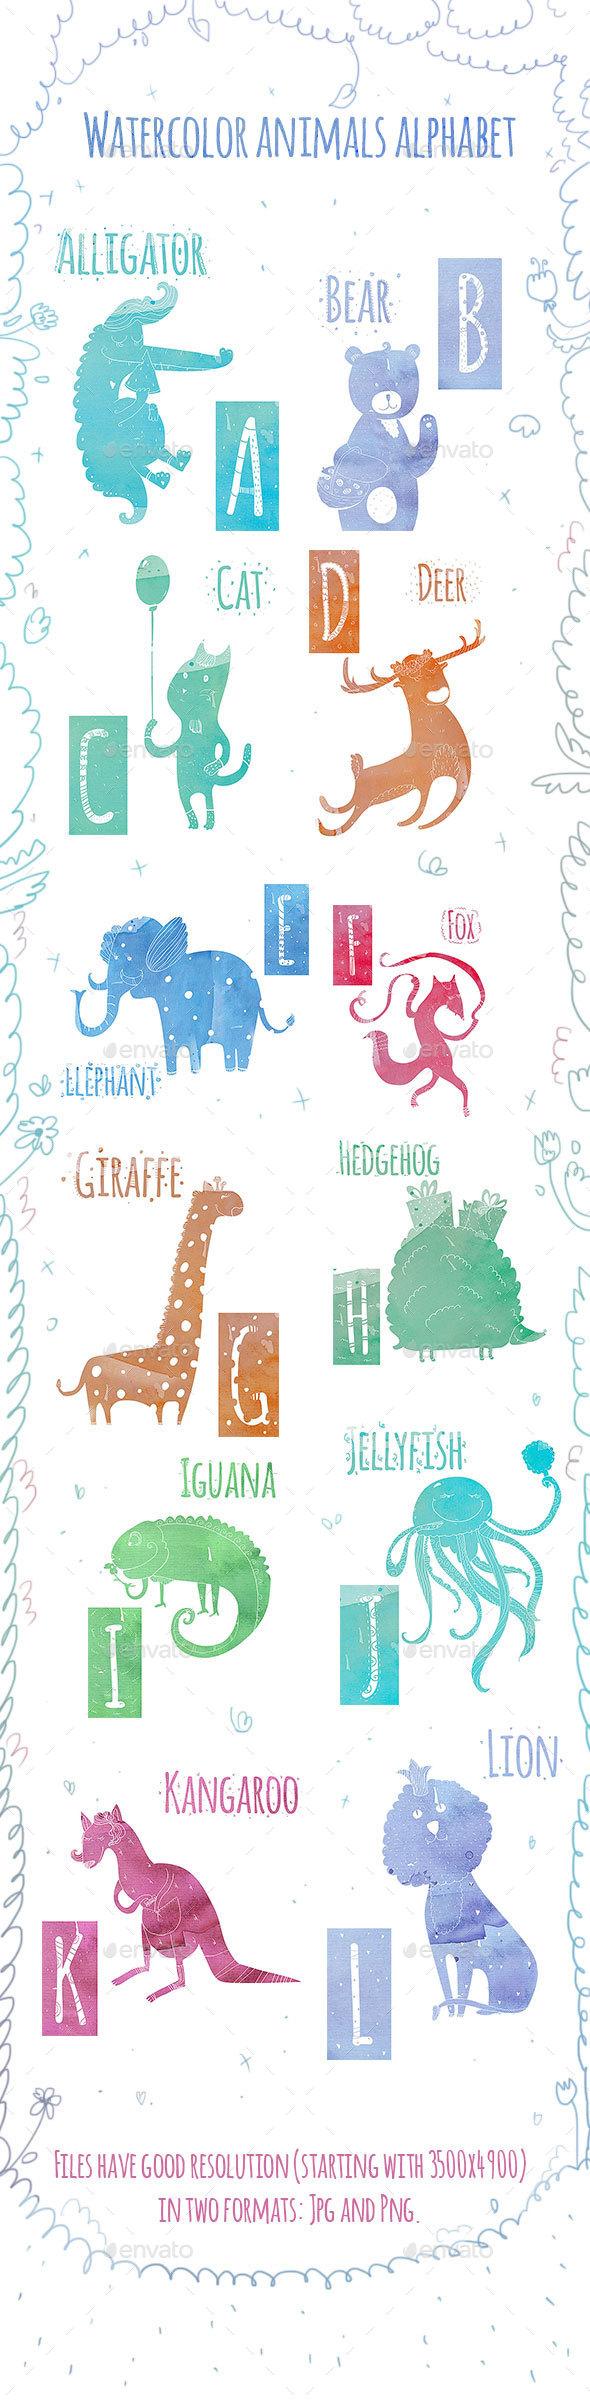 Animal Watercolor Alphabet (A-L) - Decorative Graphics